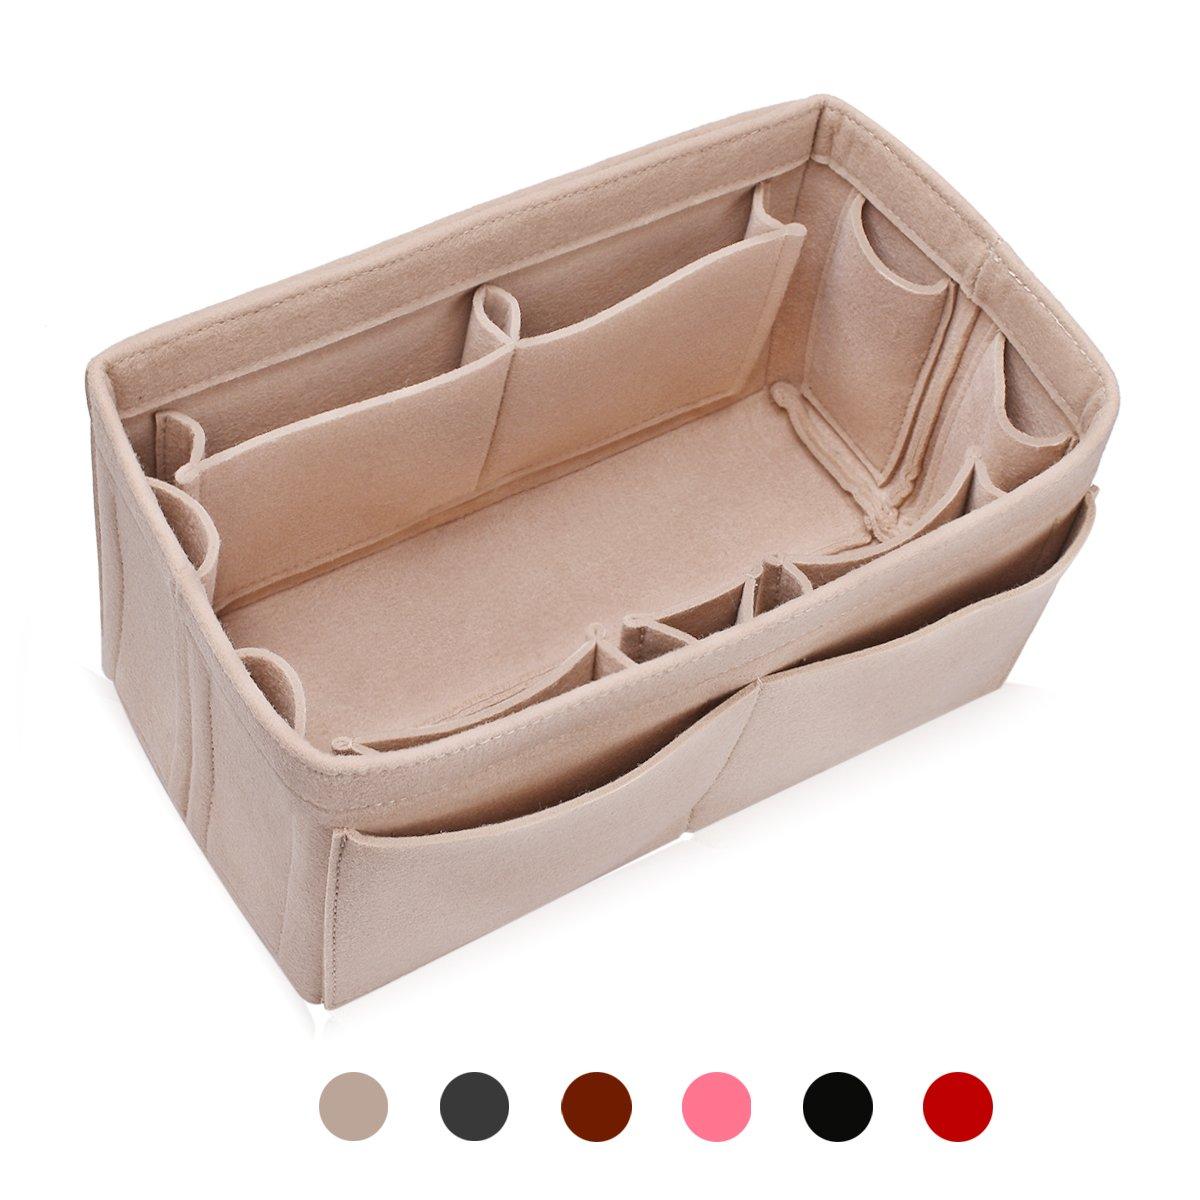 MakeUper Felt Purse Insert Organizer, Handbag Organizer, Bag in Bag, Diaper Bag Organizer, 12 Compartments, 3 Sizes